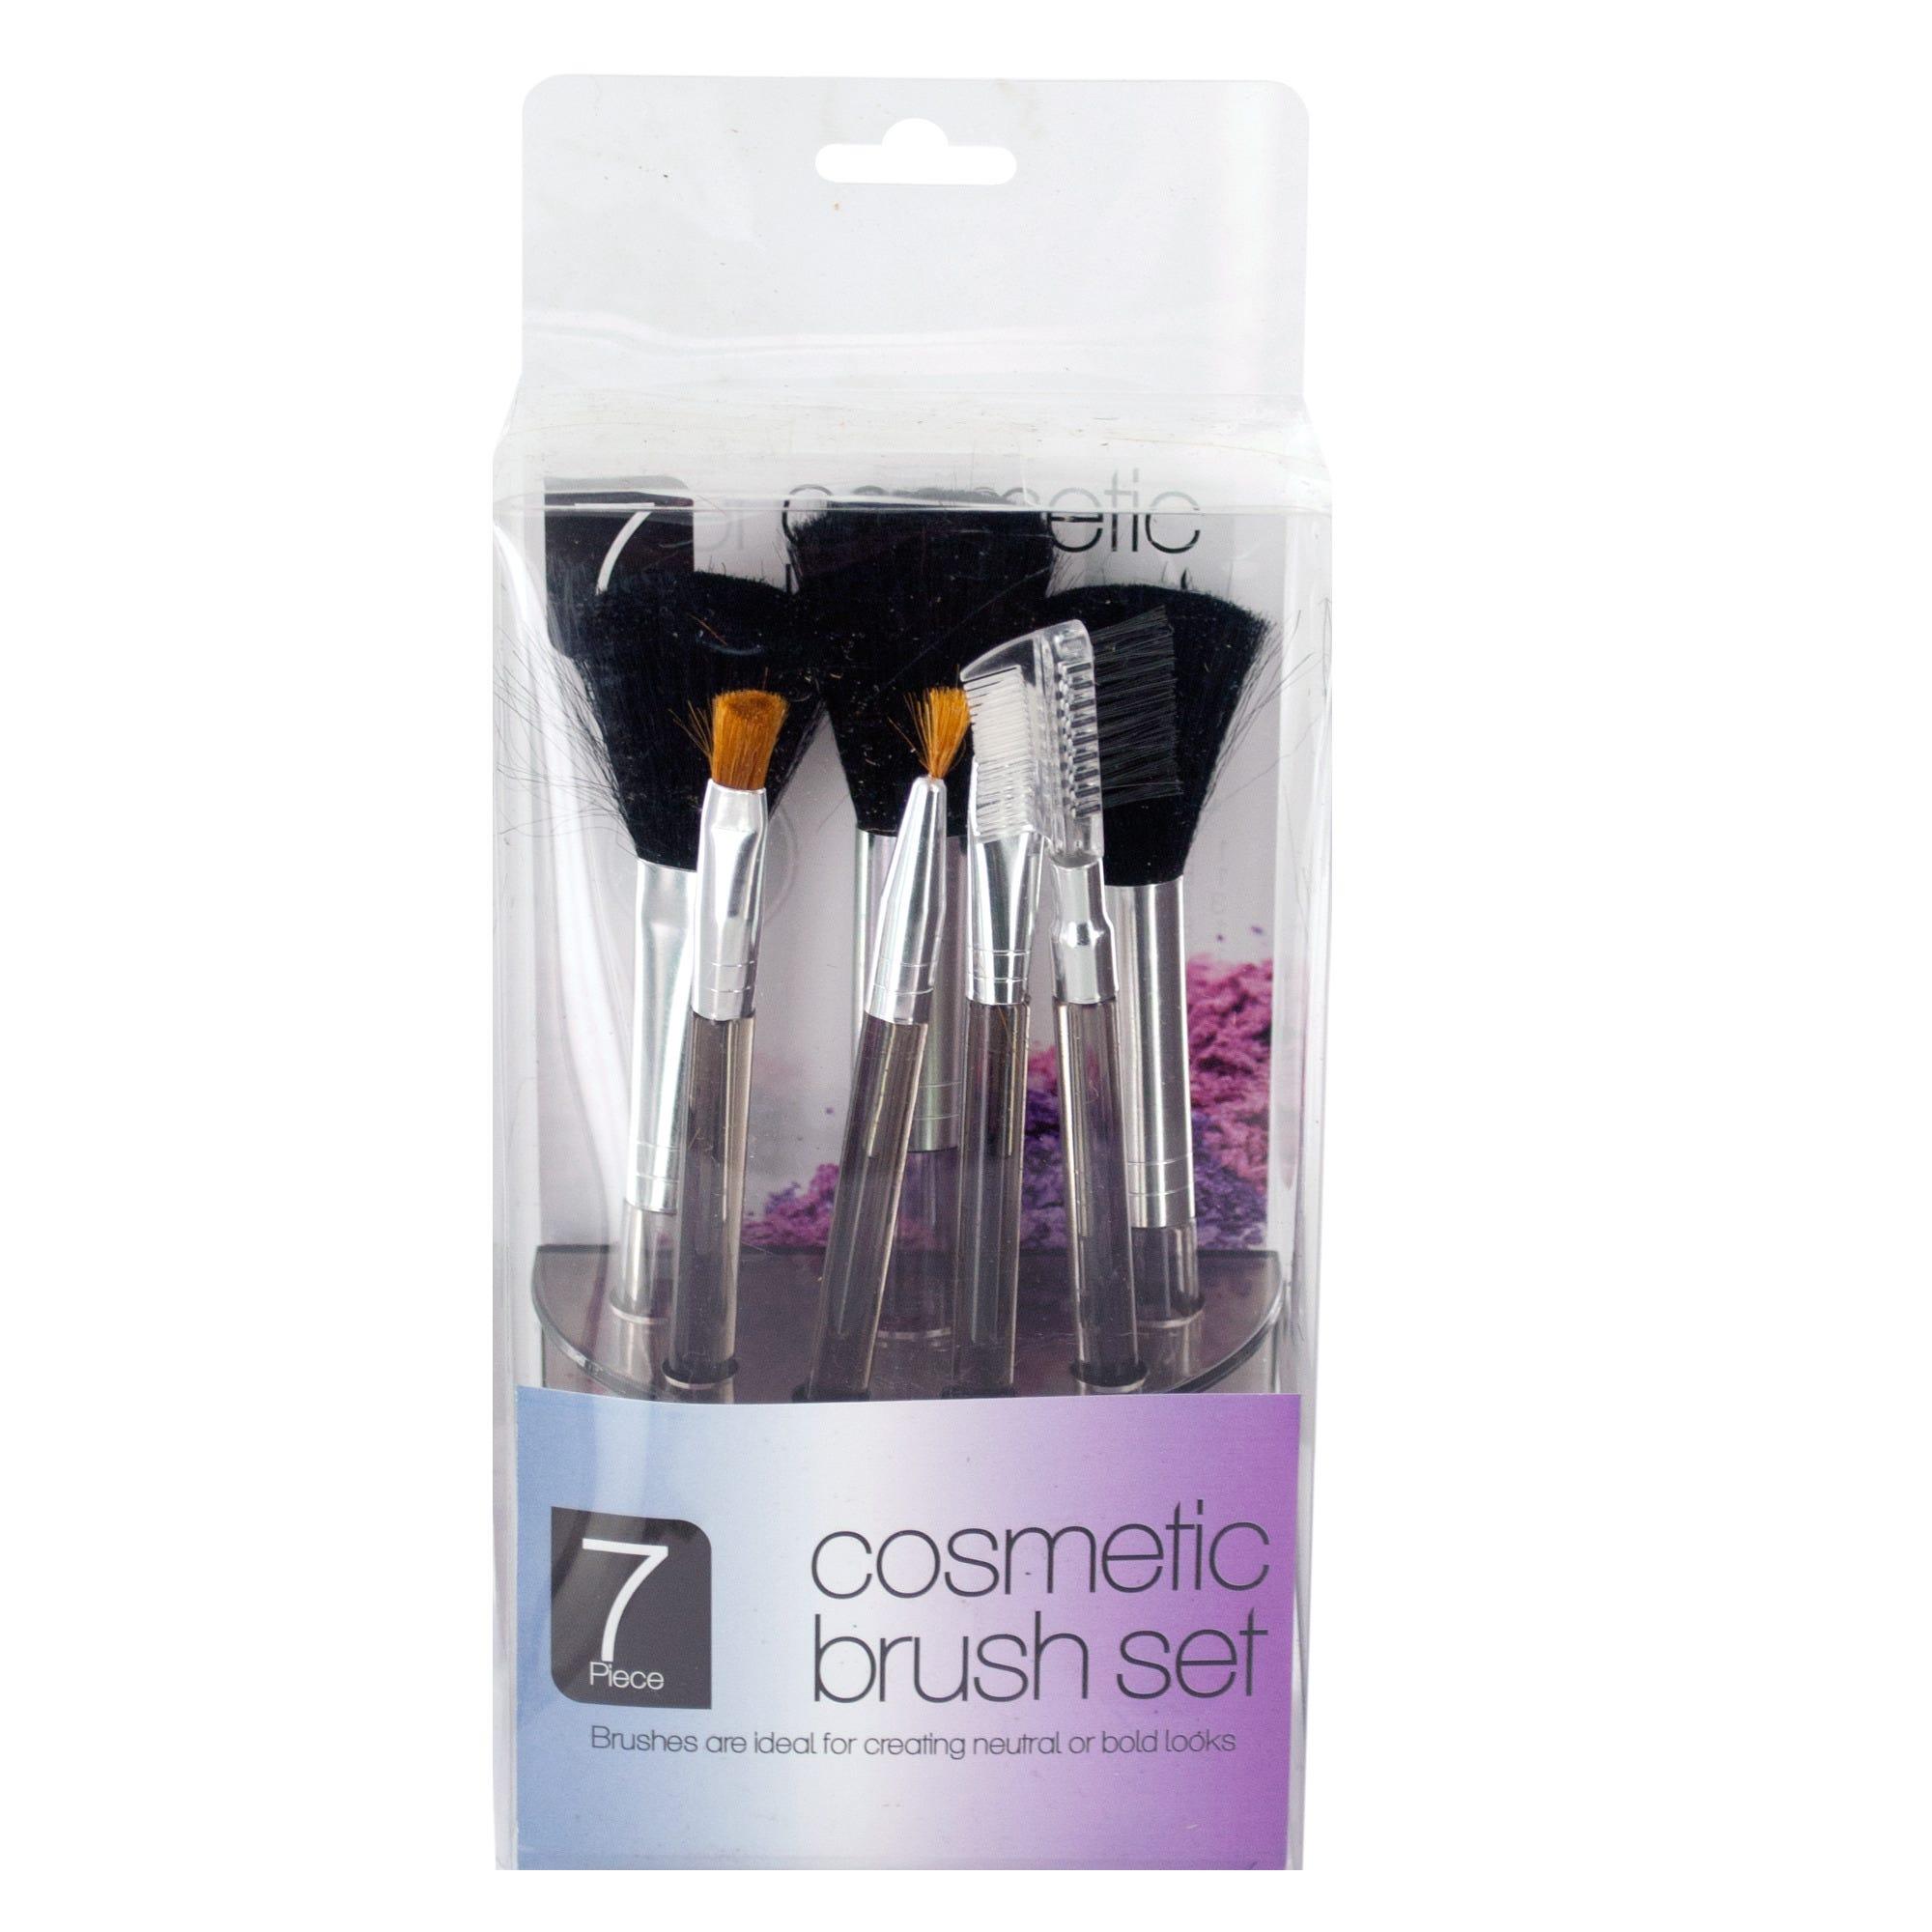 cosmetic-brush-set-in-standing-organizer